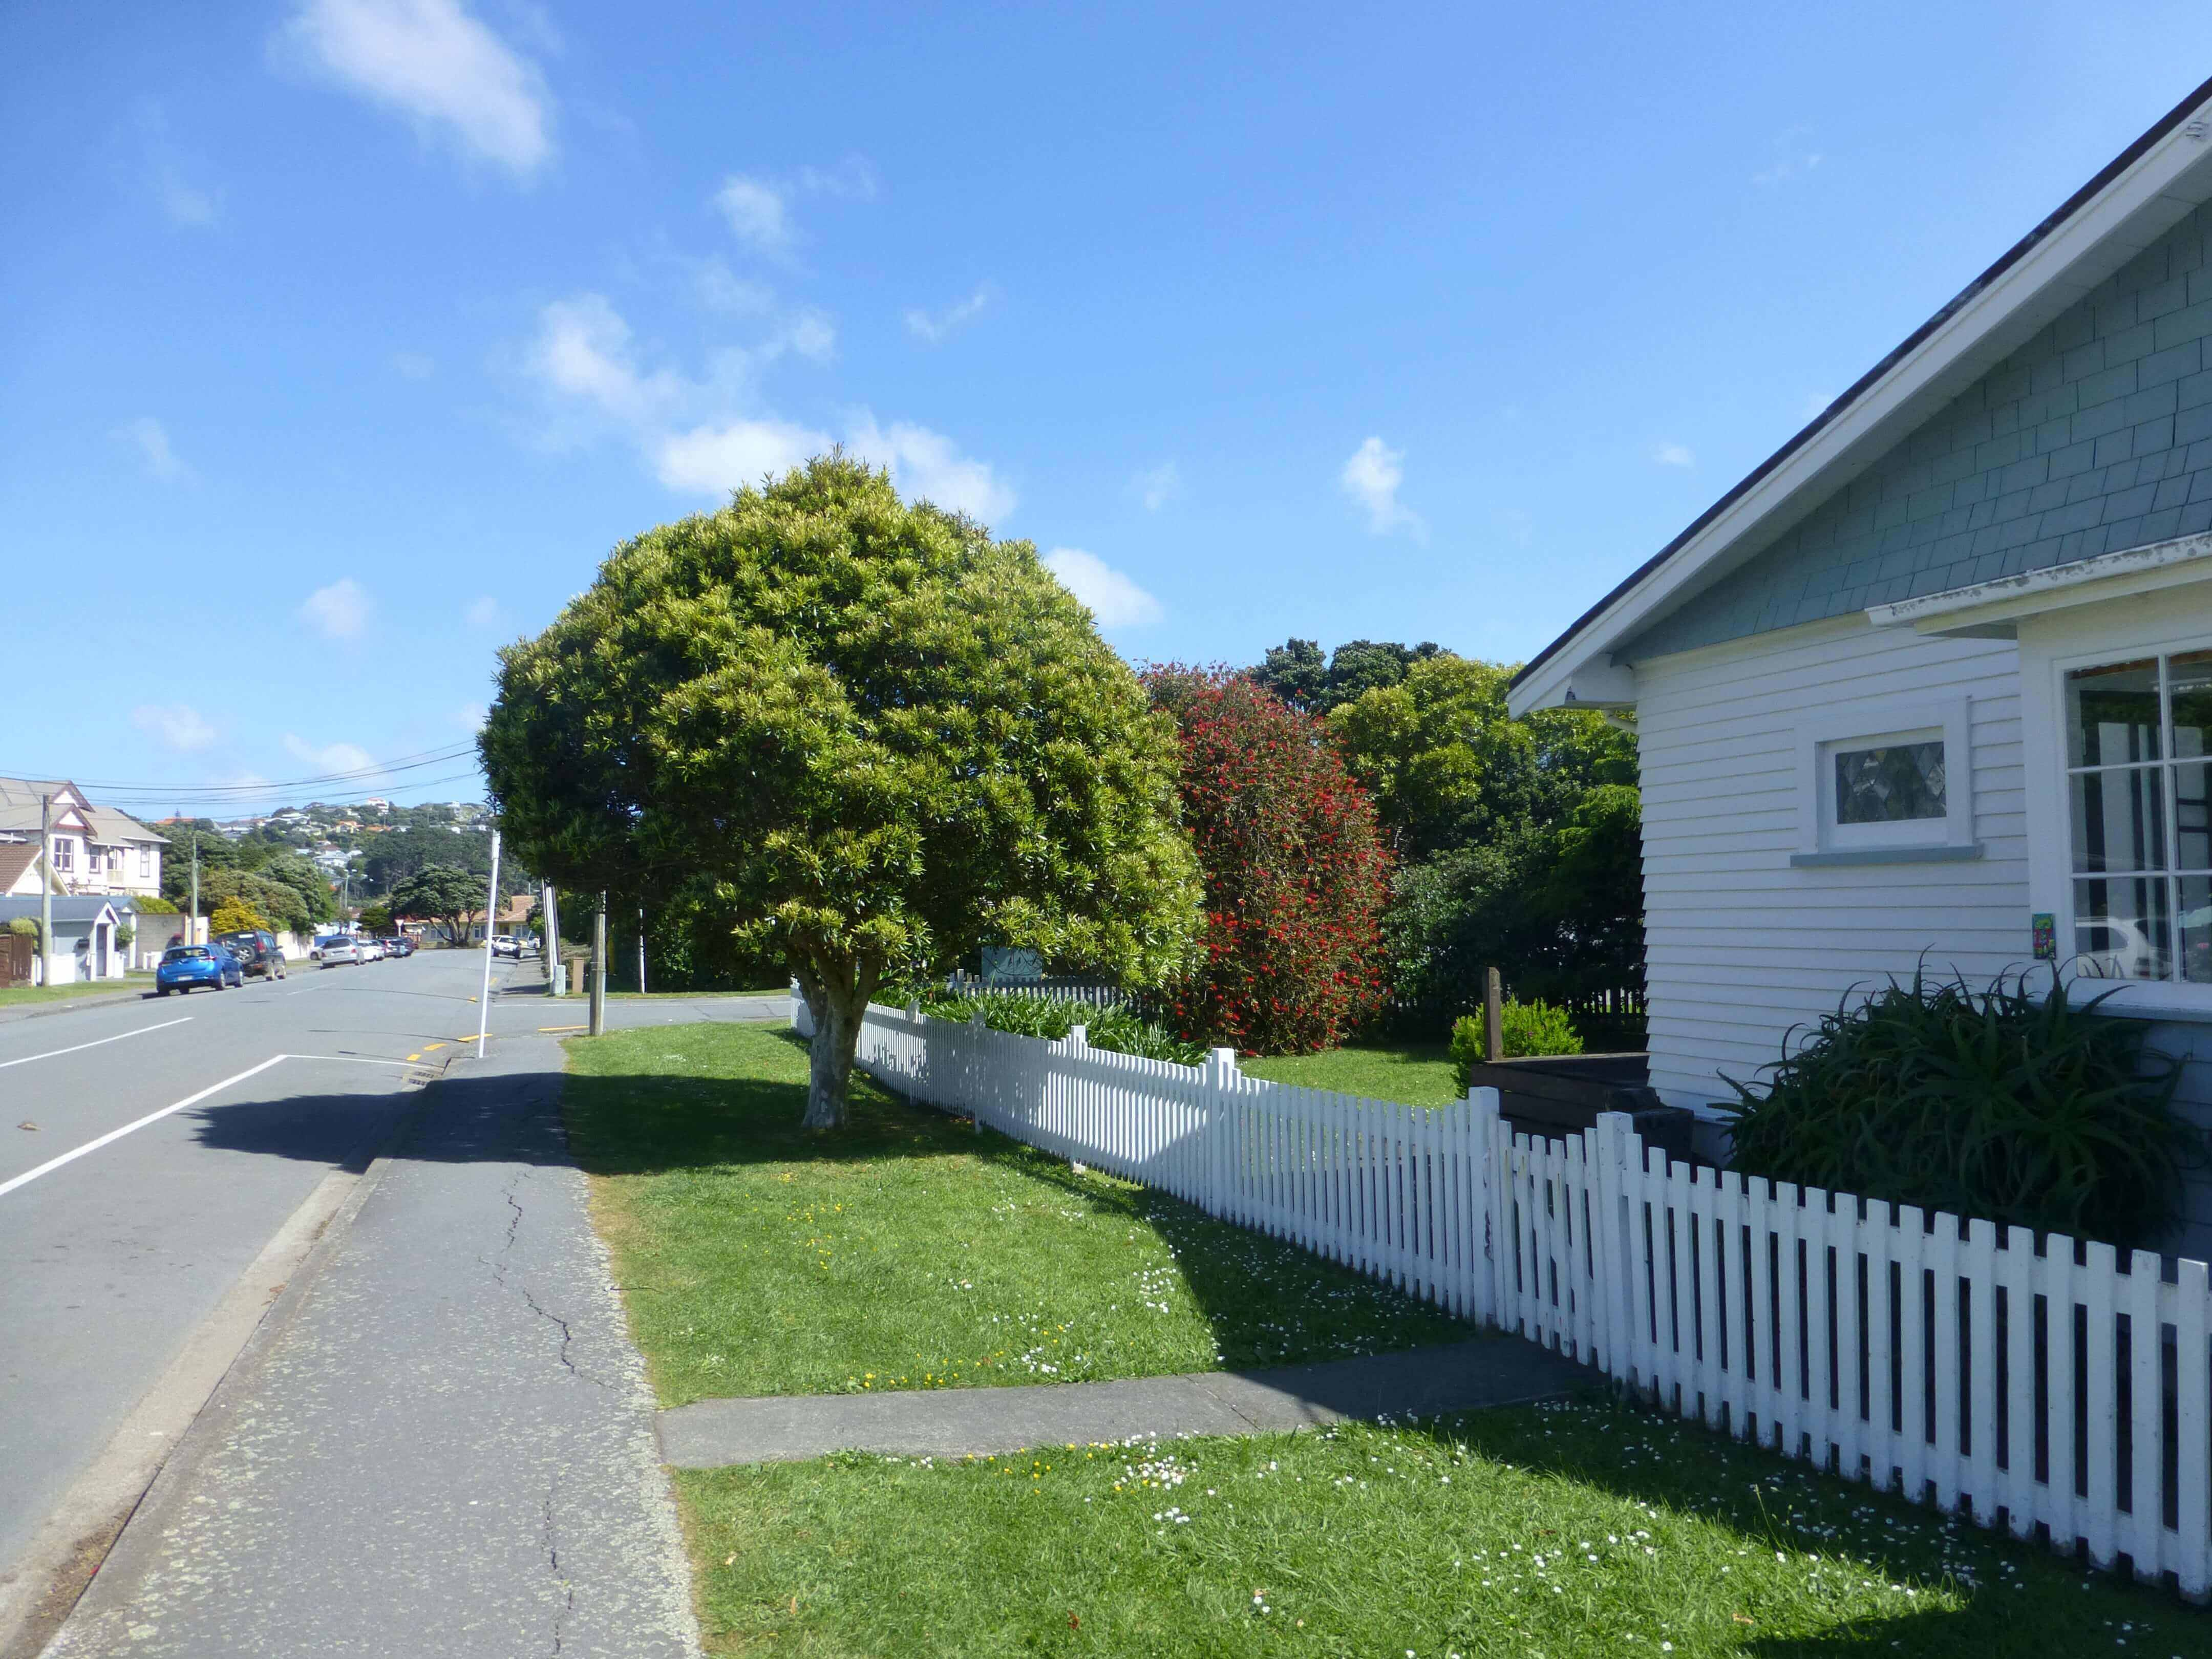 Wellington, in Miramar auf dem Weg zum Weta Shop, Weit-weg.reisen 10